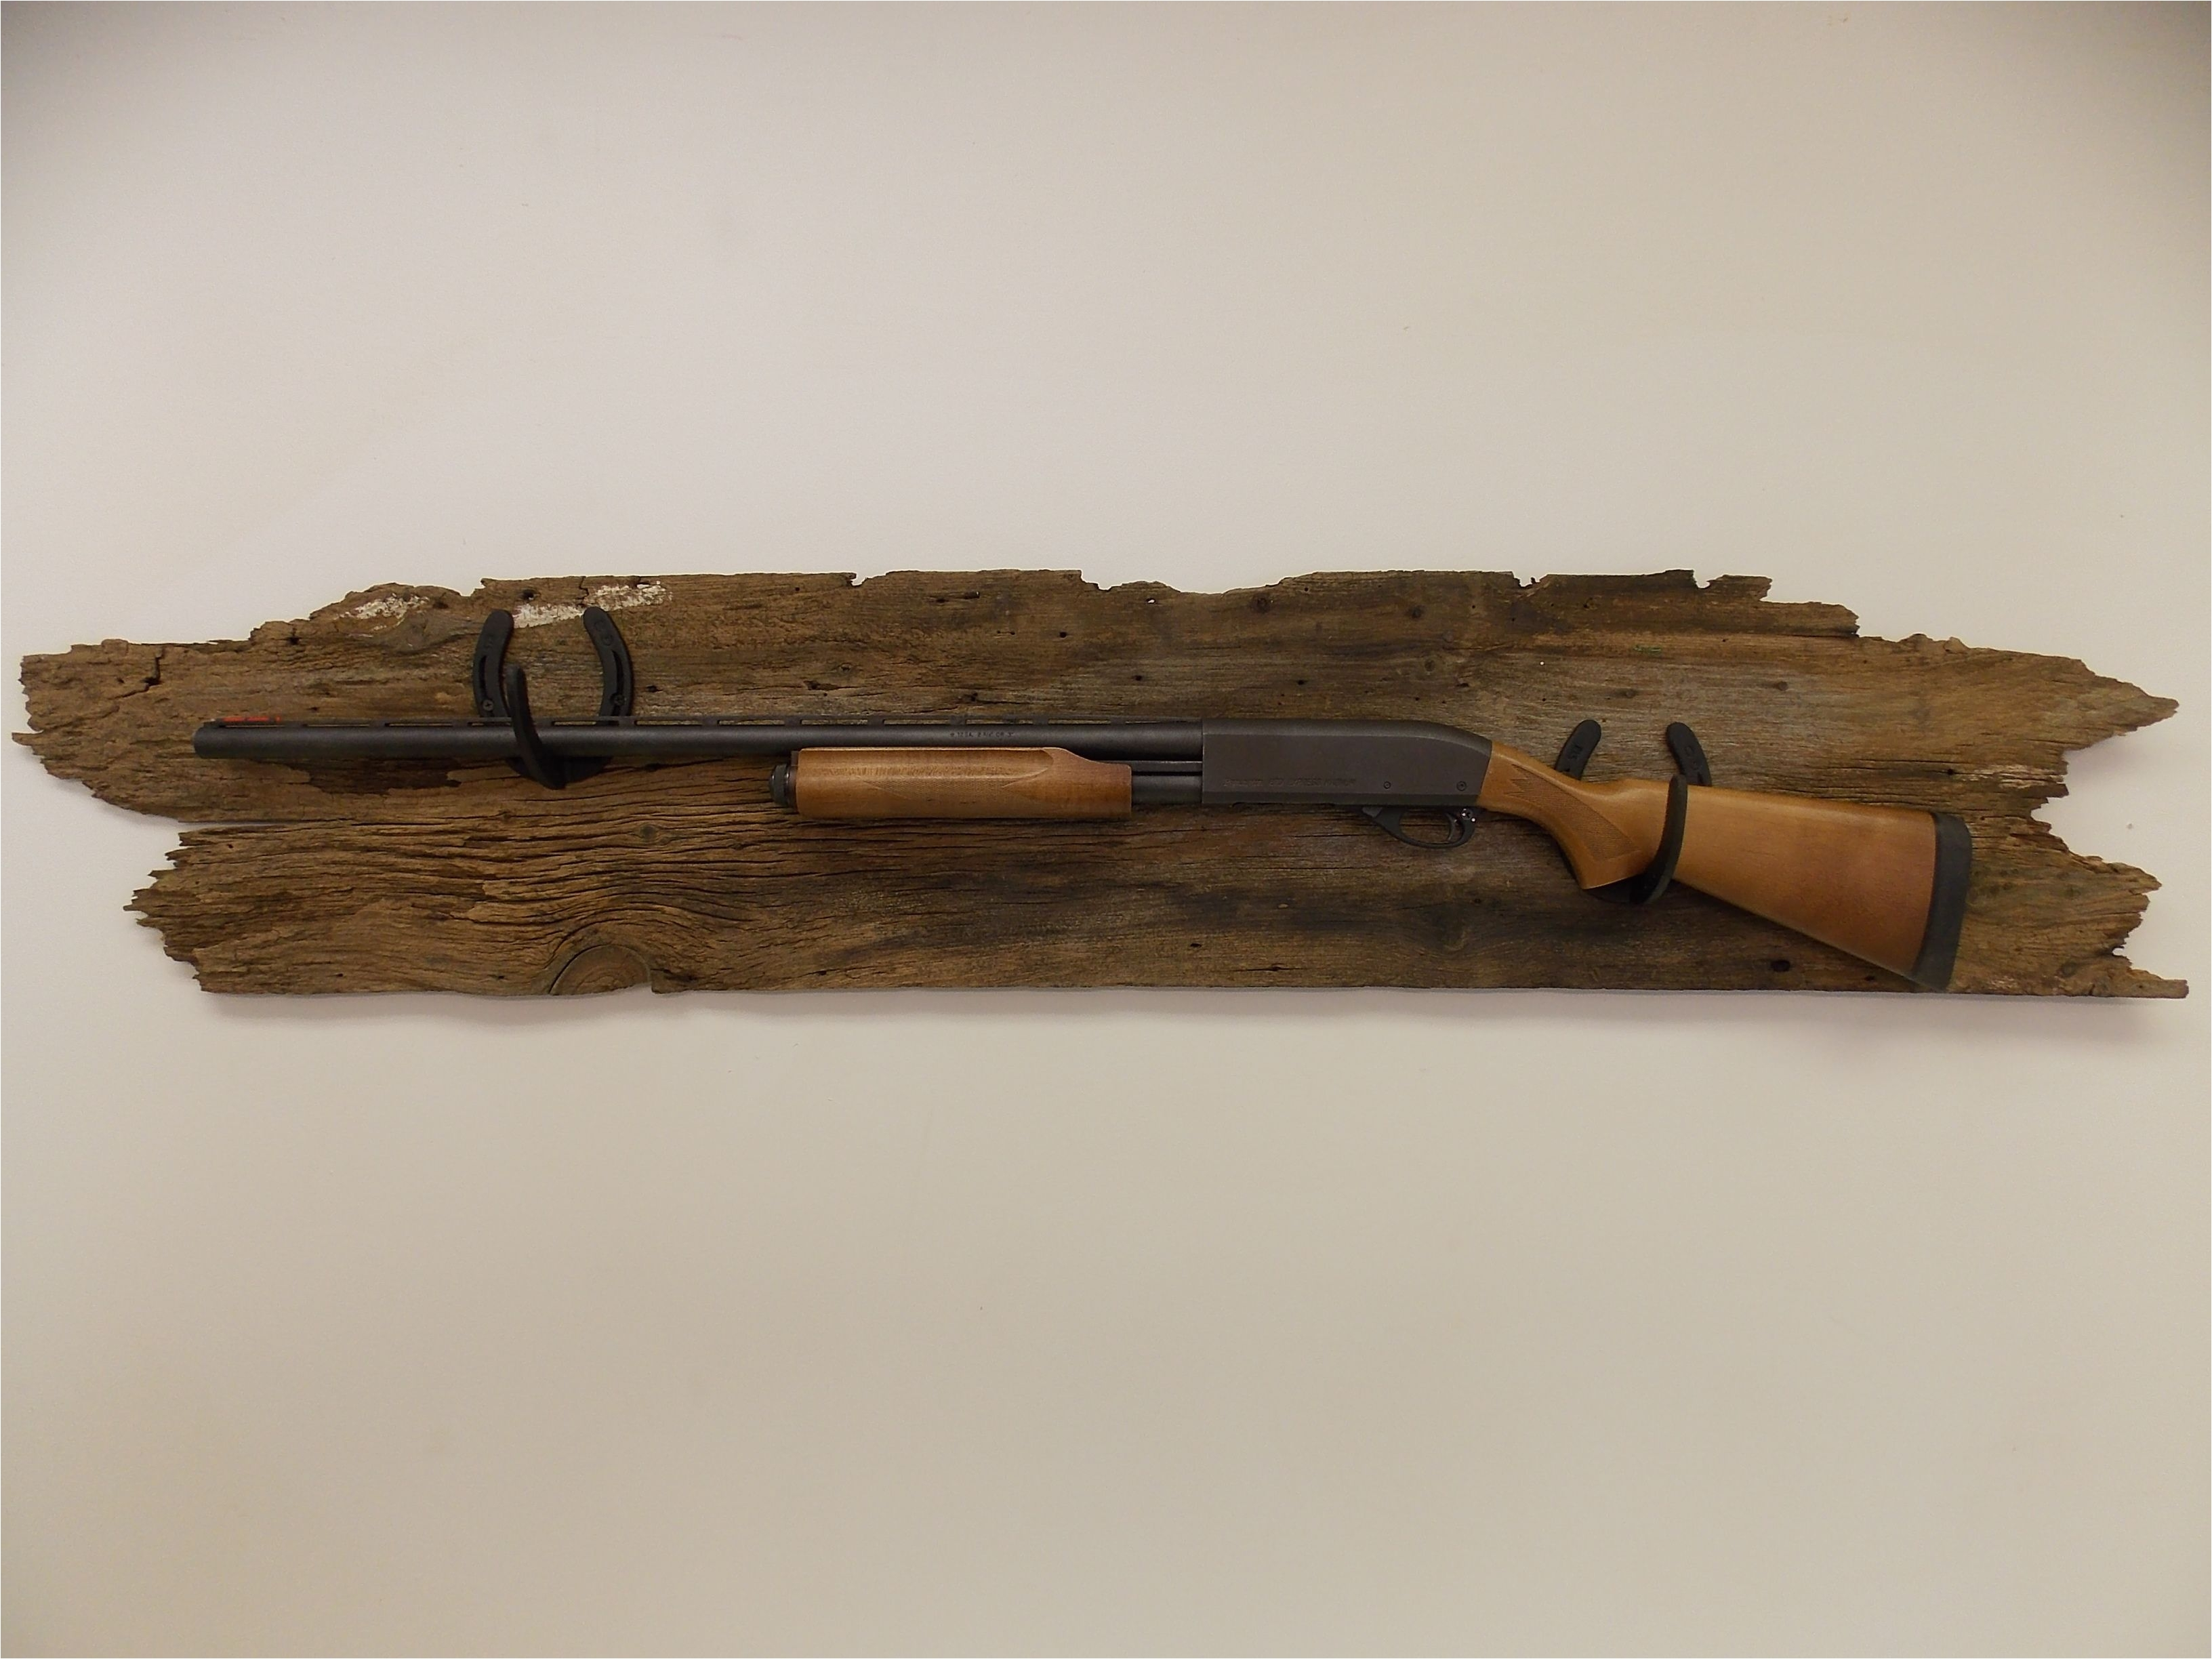 Wood Gun Rack Plans Free Gun Rack Made From Horseshoes Great Idea for My Shotgun that Was